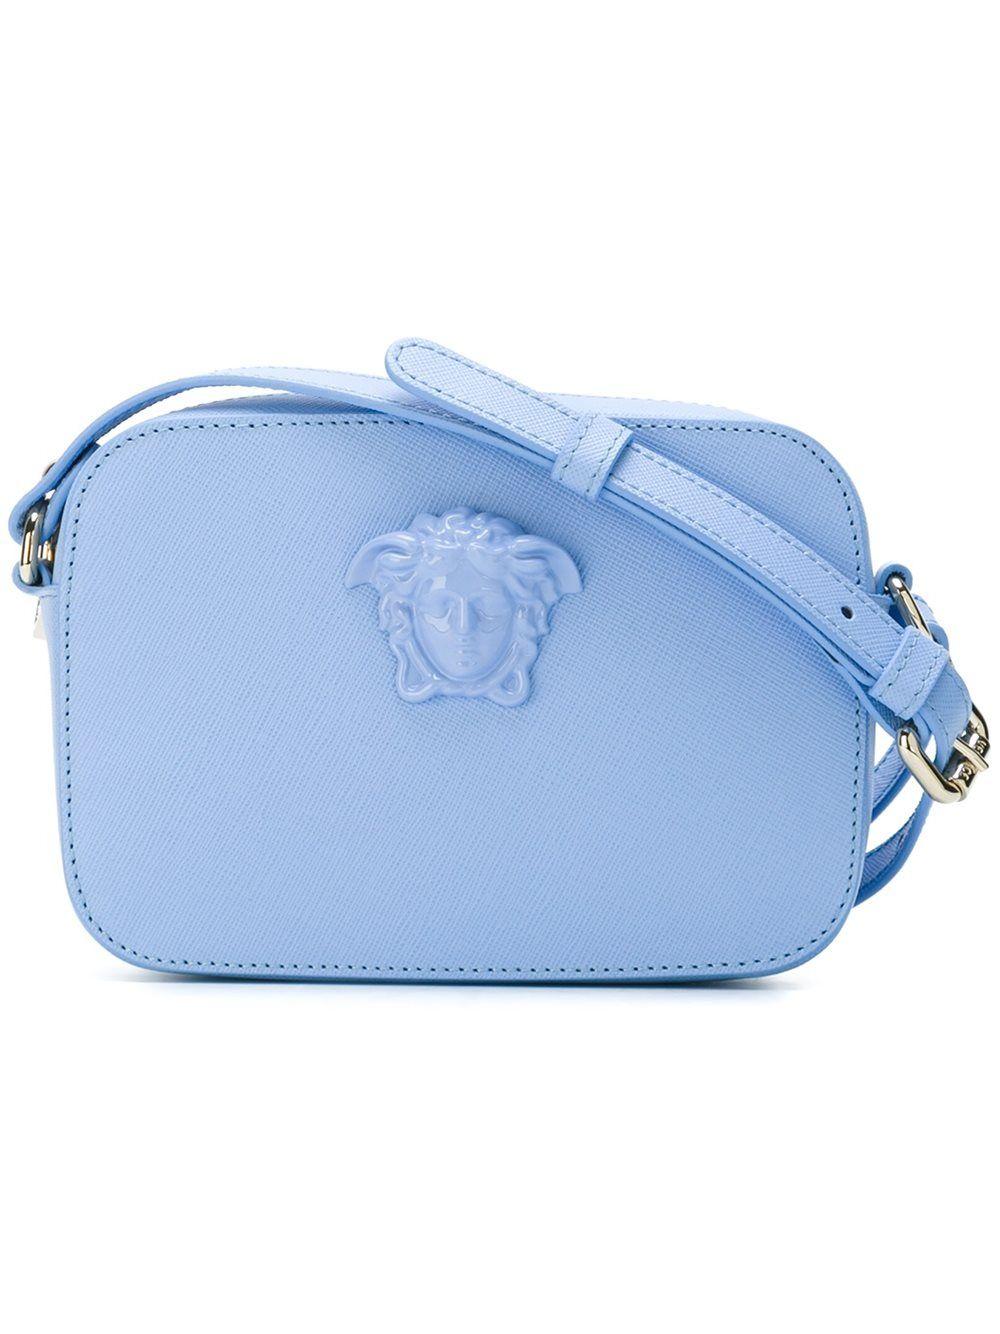 1672efc44f76 Versace small  Palazzo Medusa  shoulder bag